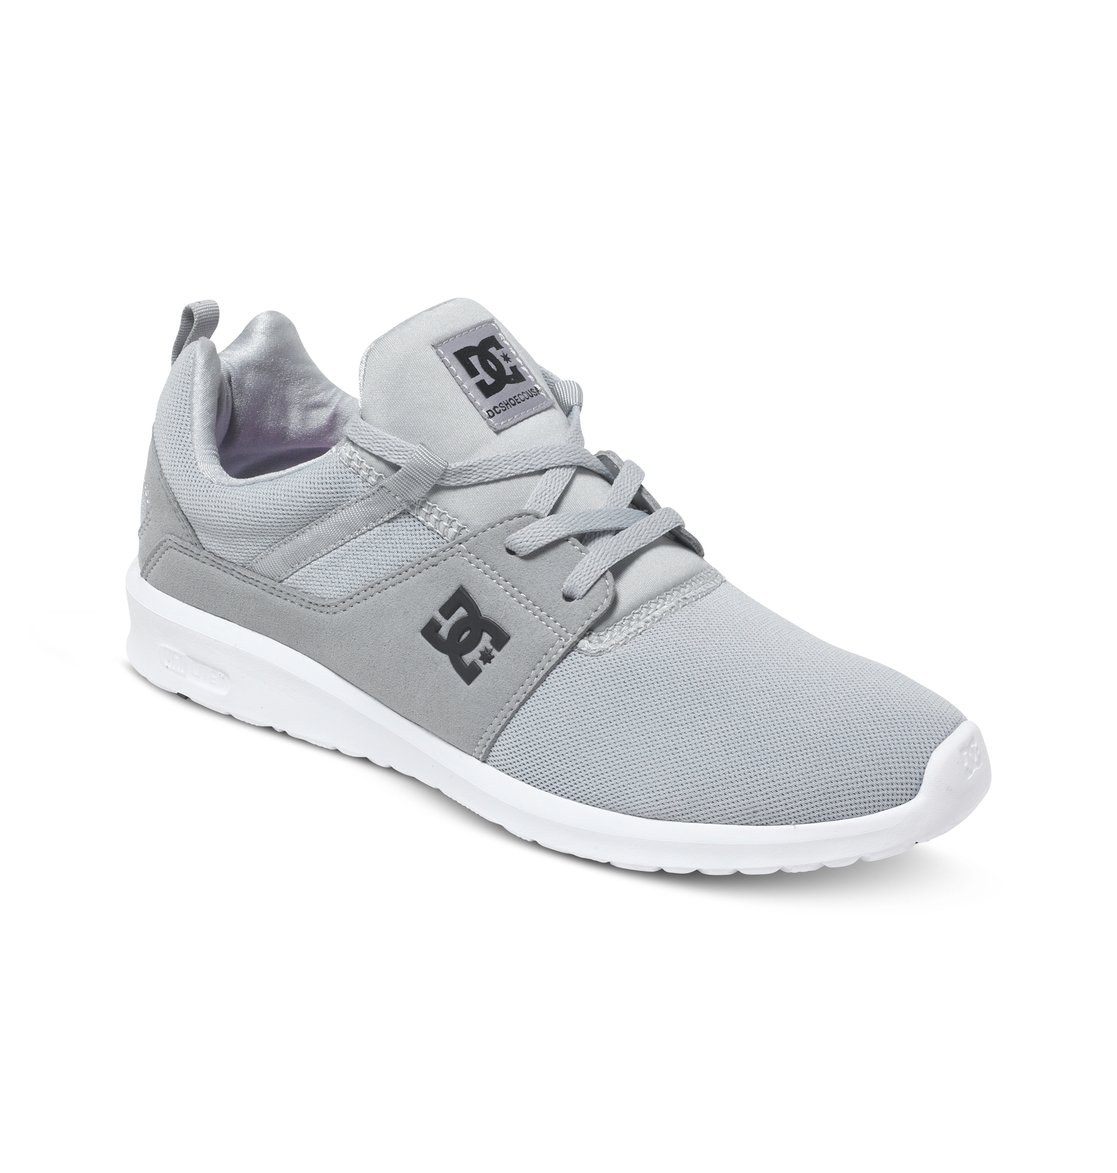 men 39 s heathrow shoes 888327204857 dc shoes. Black Bedroom Furniture Sets. Home Design Ideas